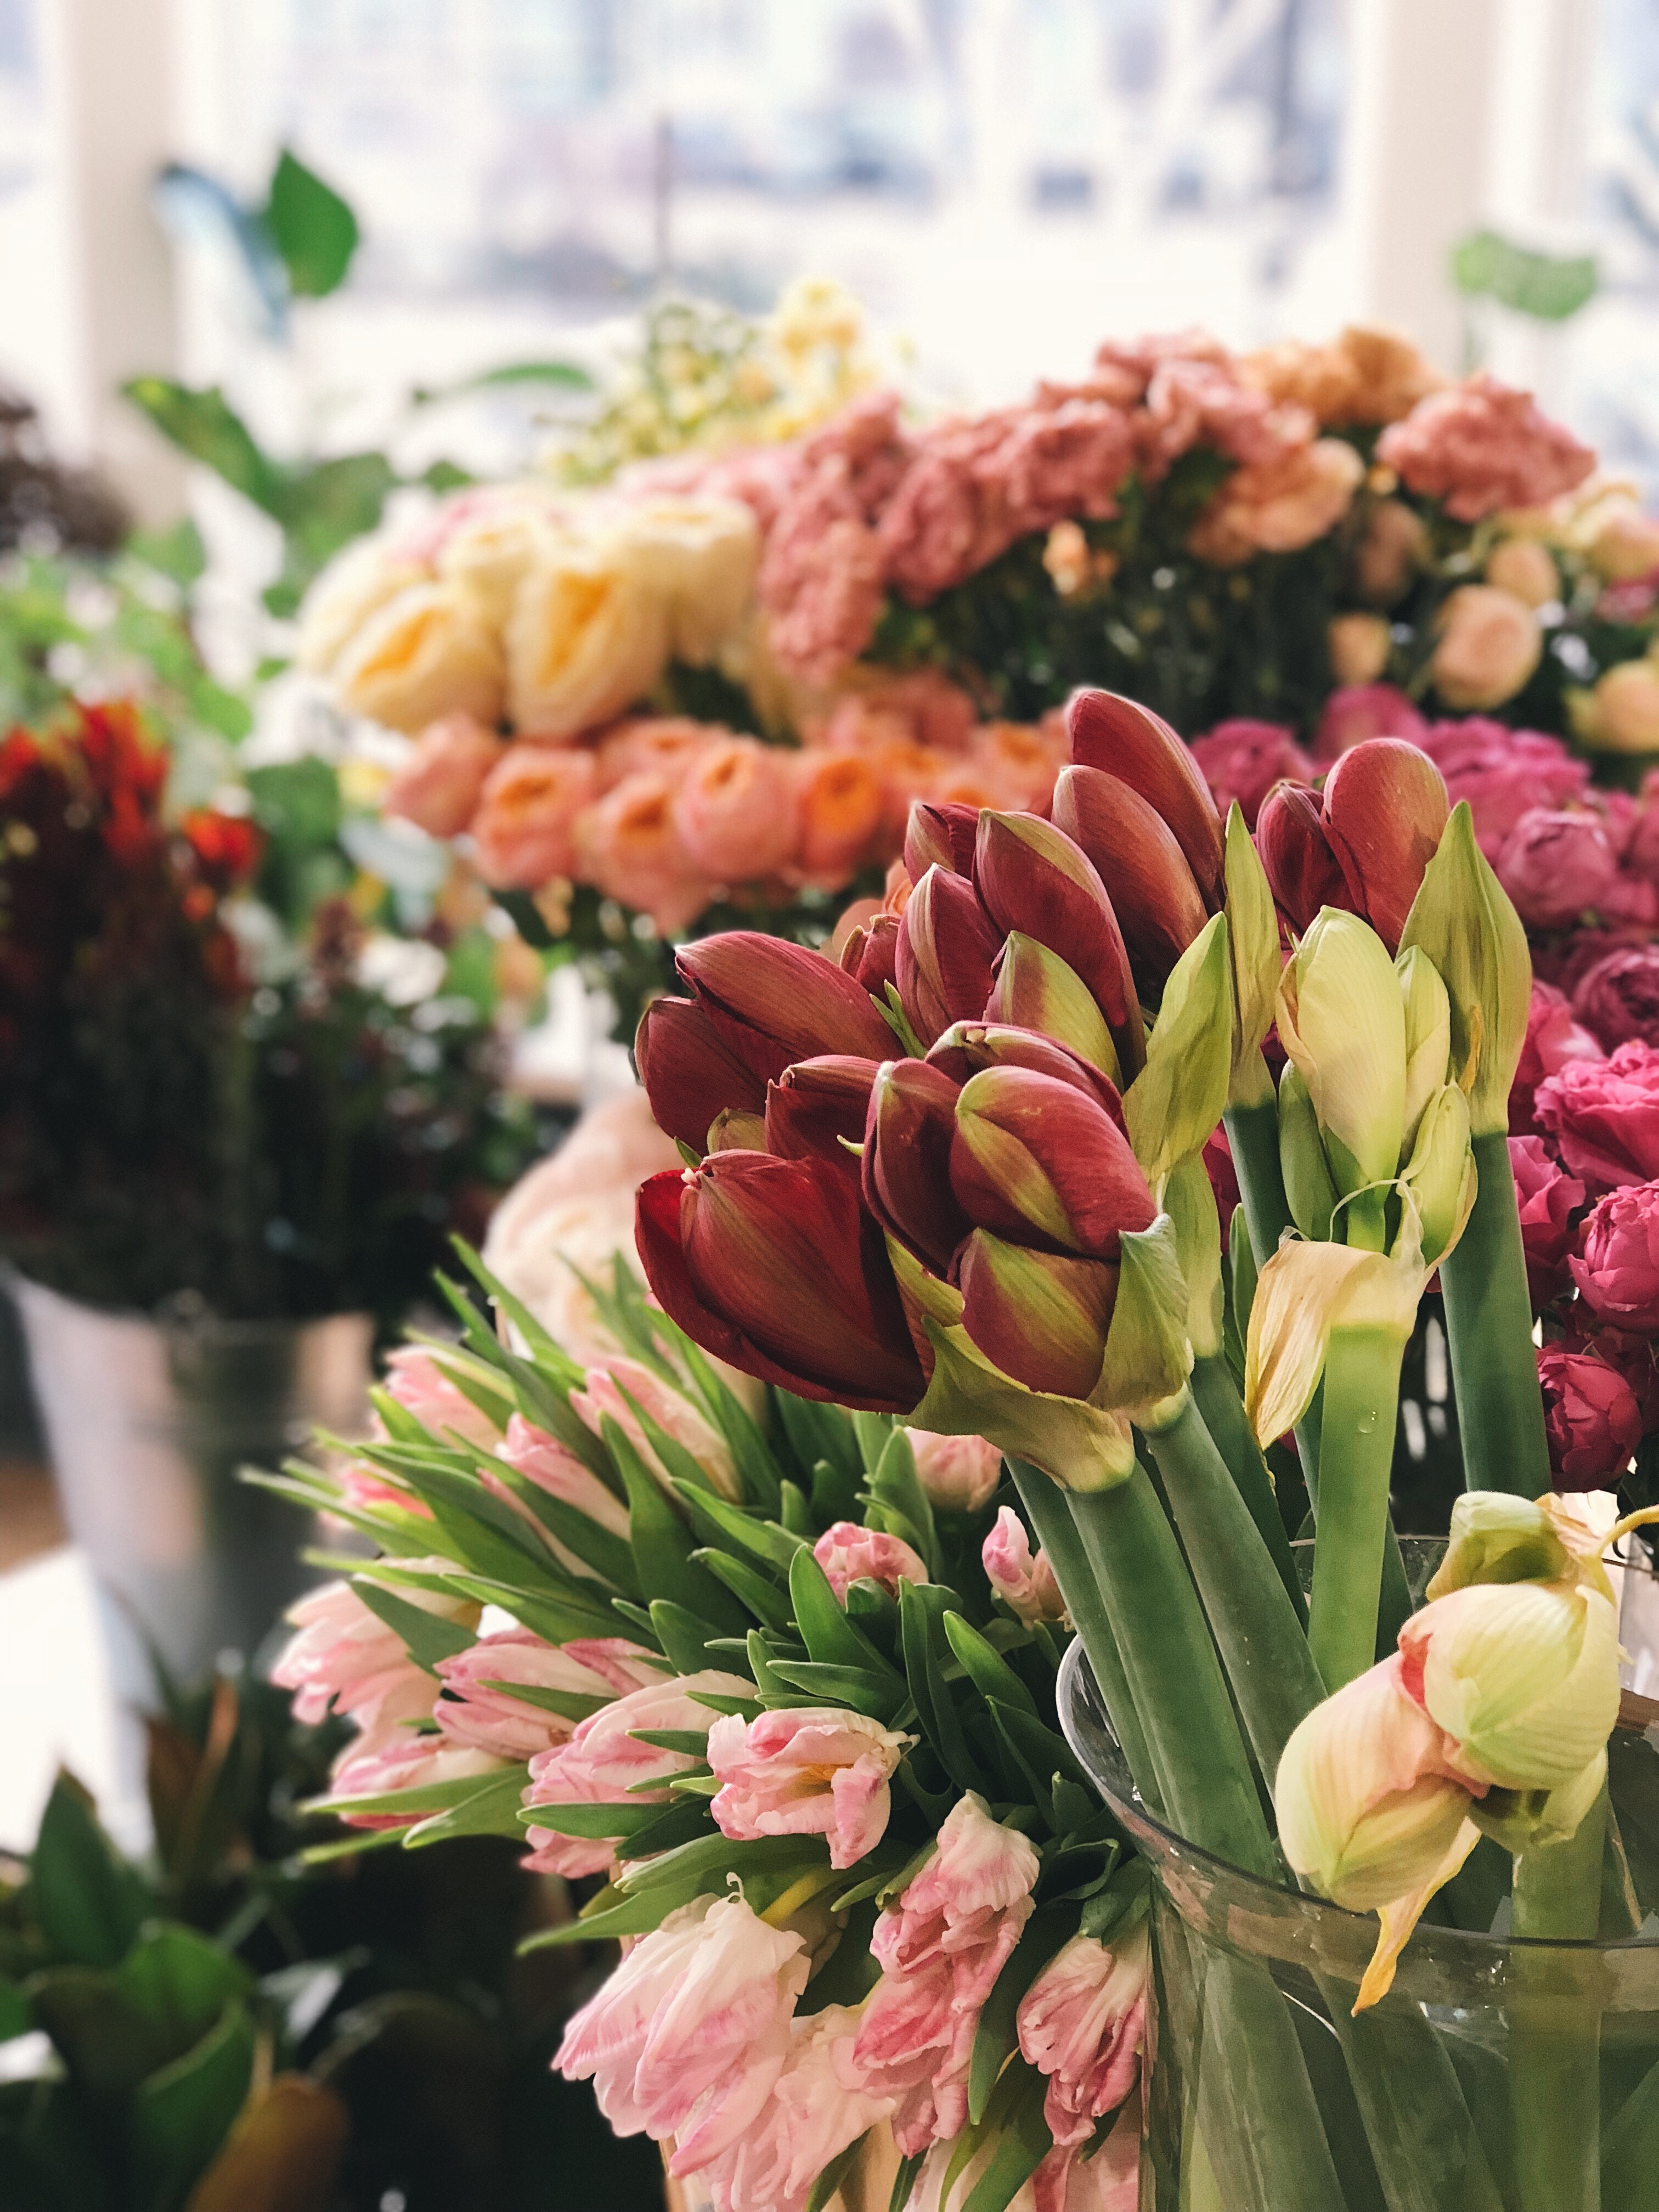 1000 Amazing Flower Shop Photos 183 Pexels 183 Free Stock Photos